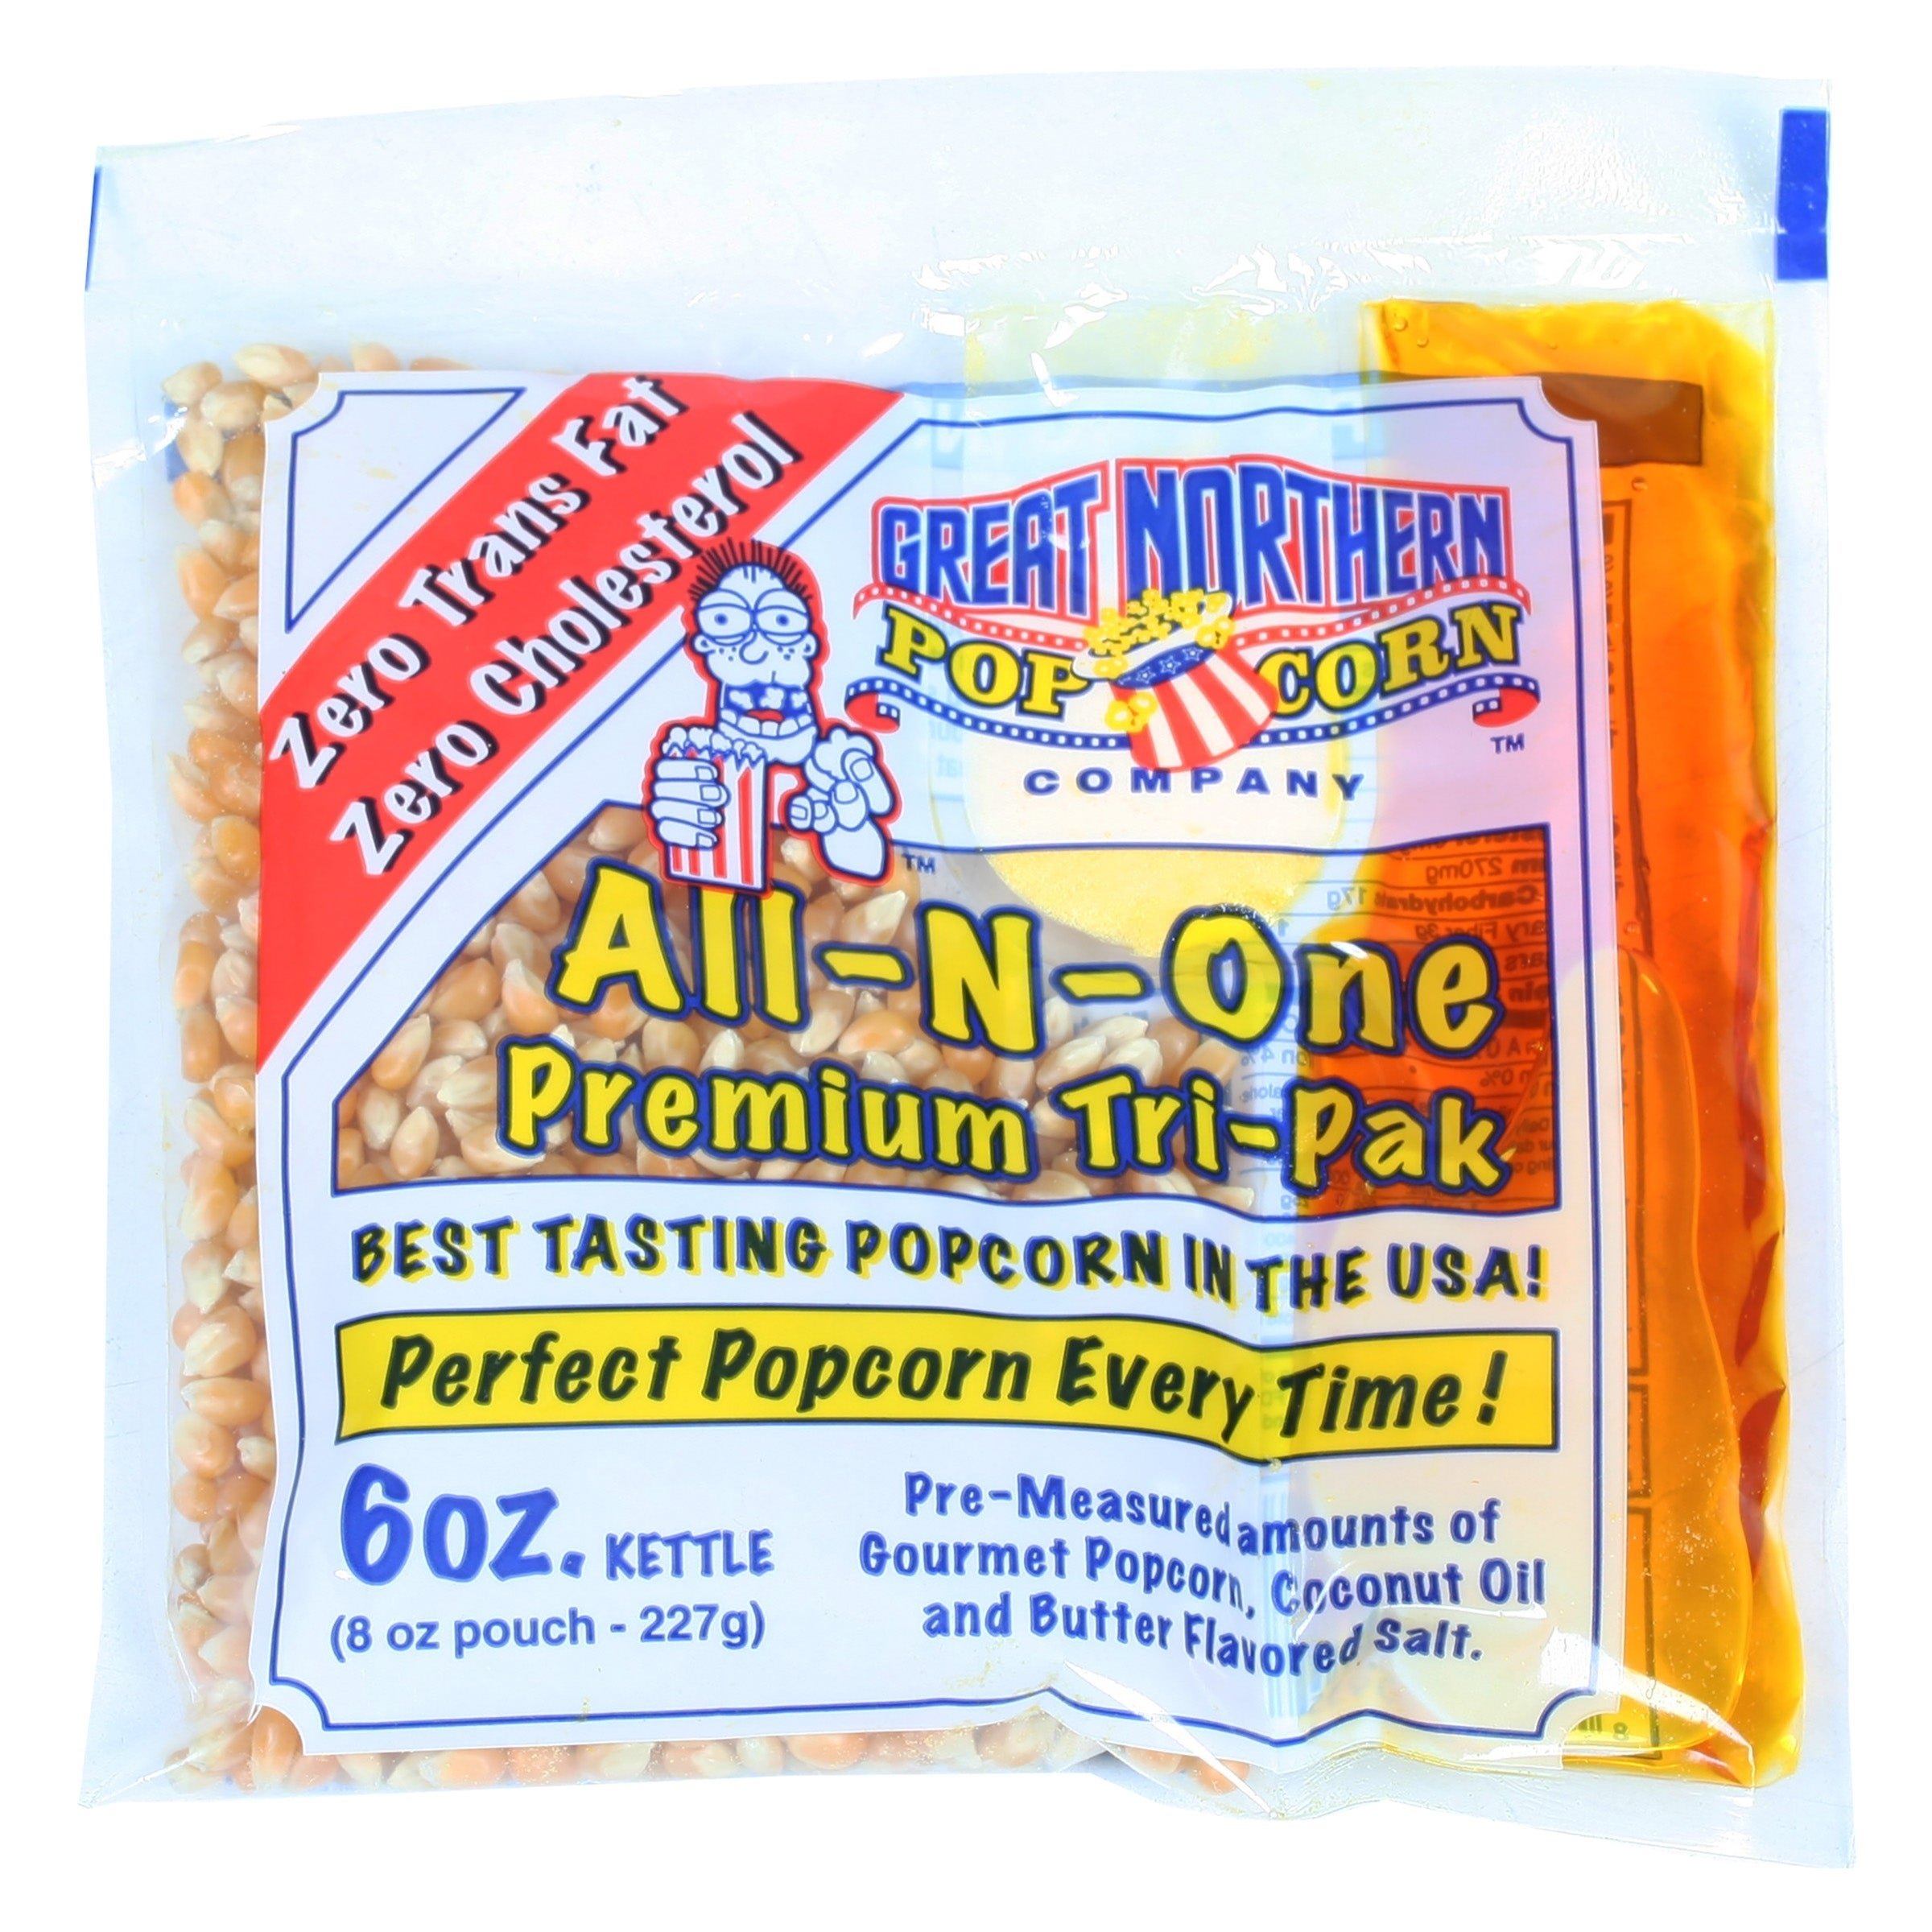 12 of 6 Ounce Popcorn Portion Packs Kit Cinema Great Northern Popcorn 1 Case